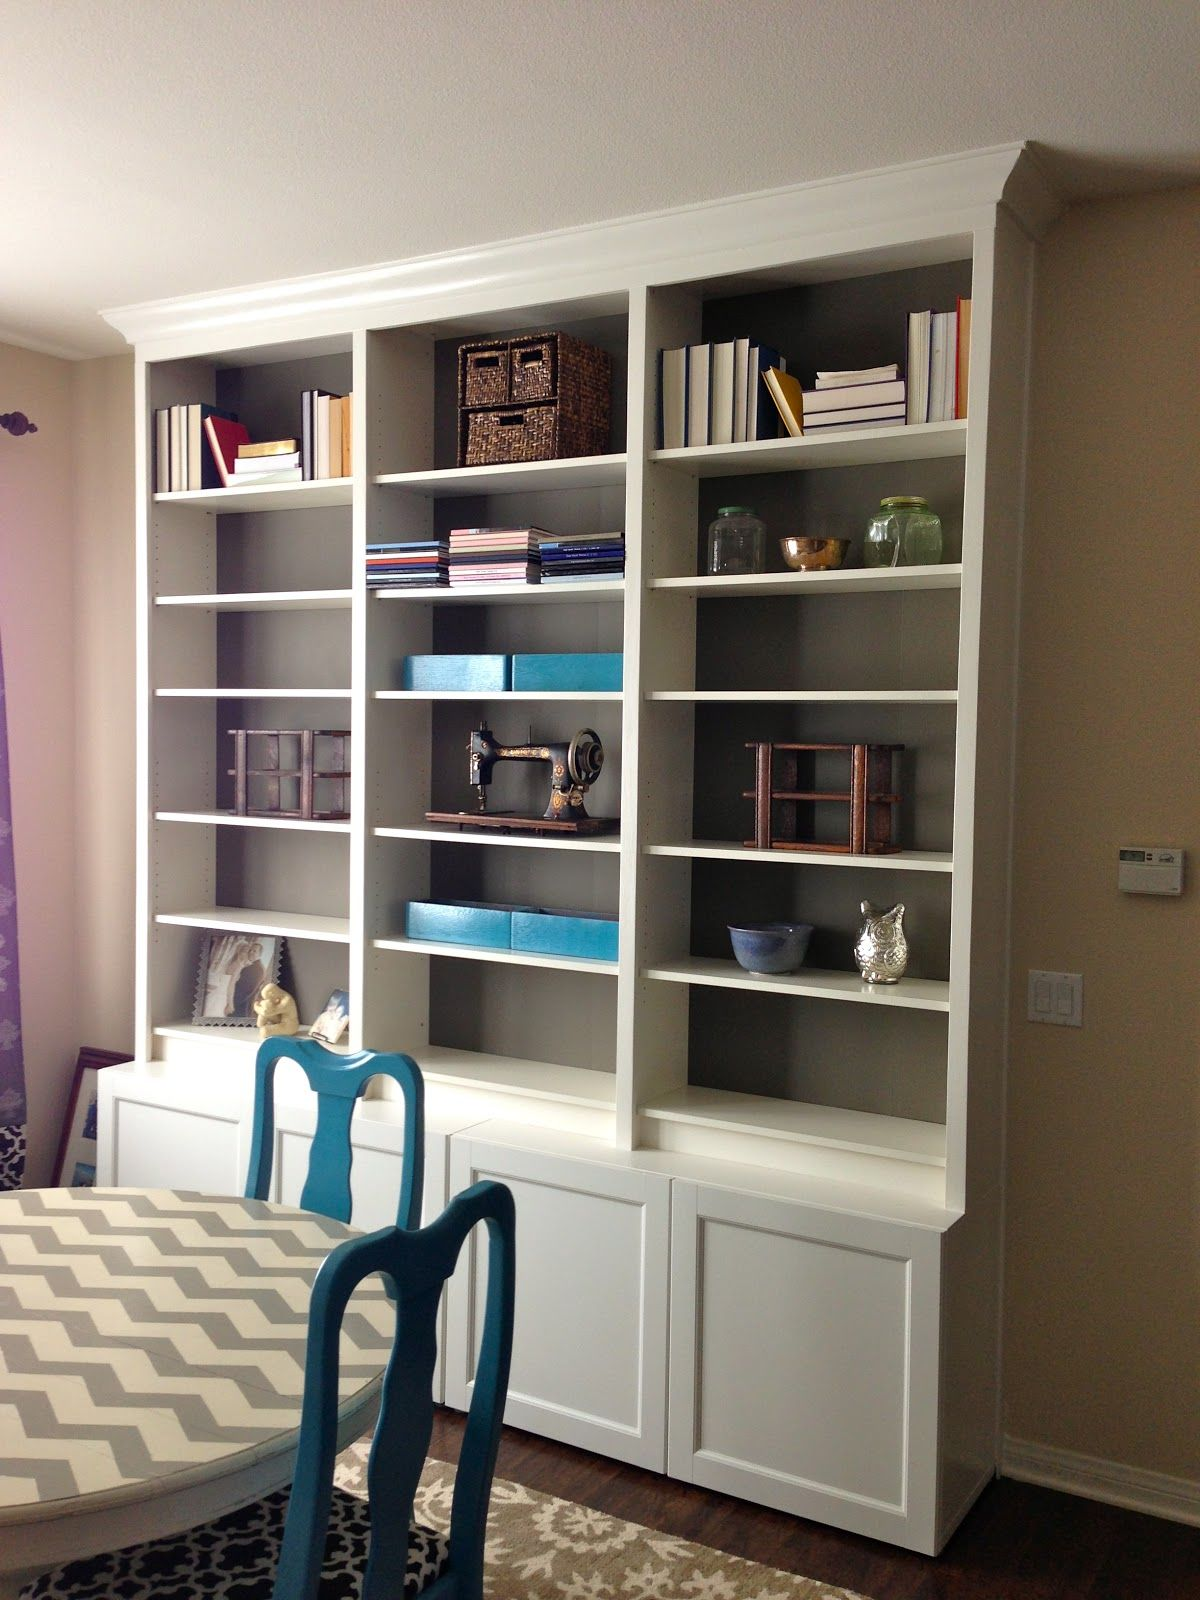 Ikea Faux Built Ins Ikea Built In Built In Bookcase Built Ins